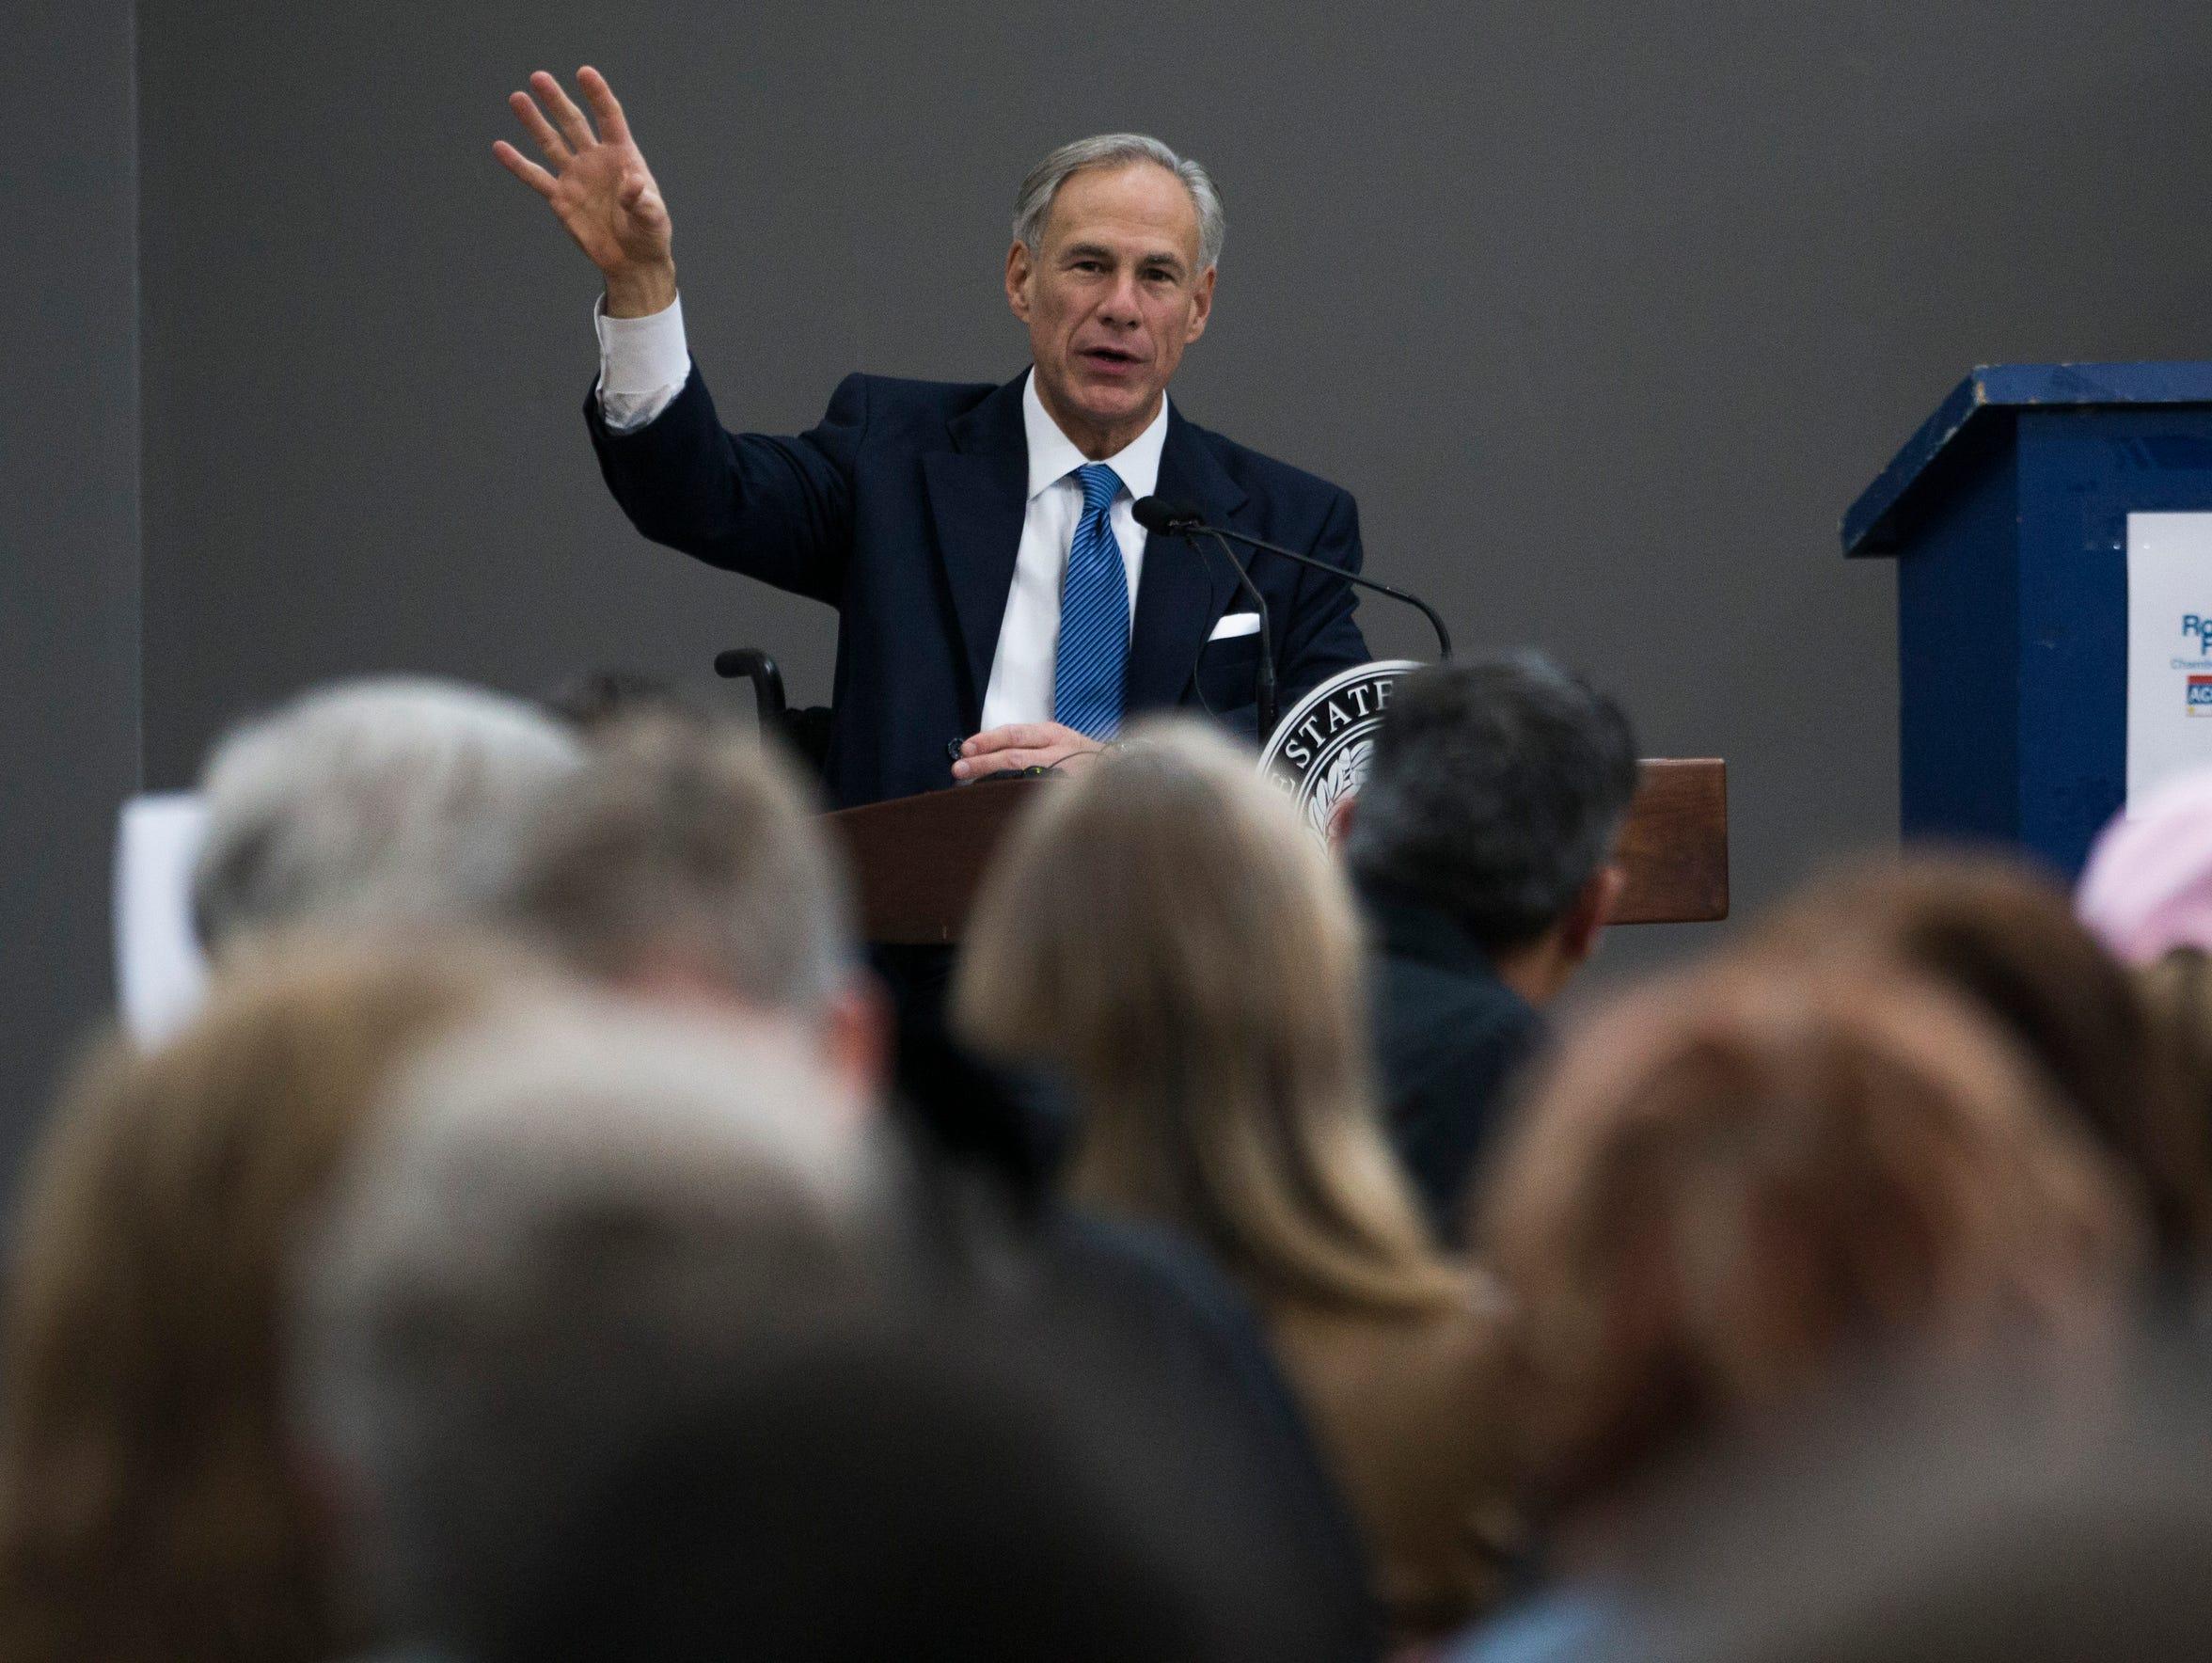 Texas Gov. Greg Abbott discusses new hazard mitigation